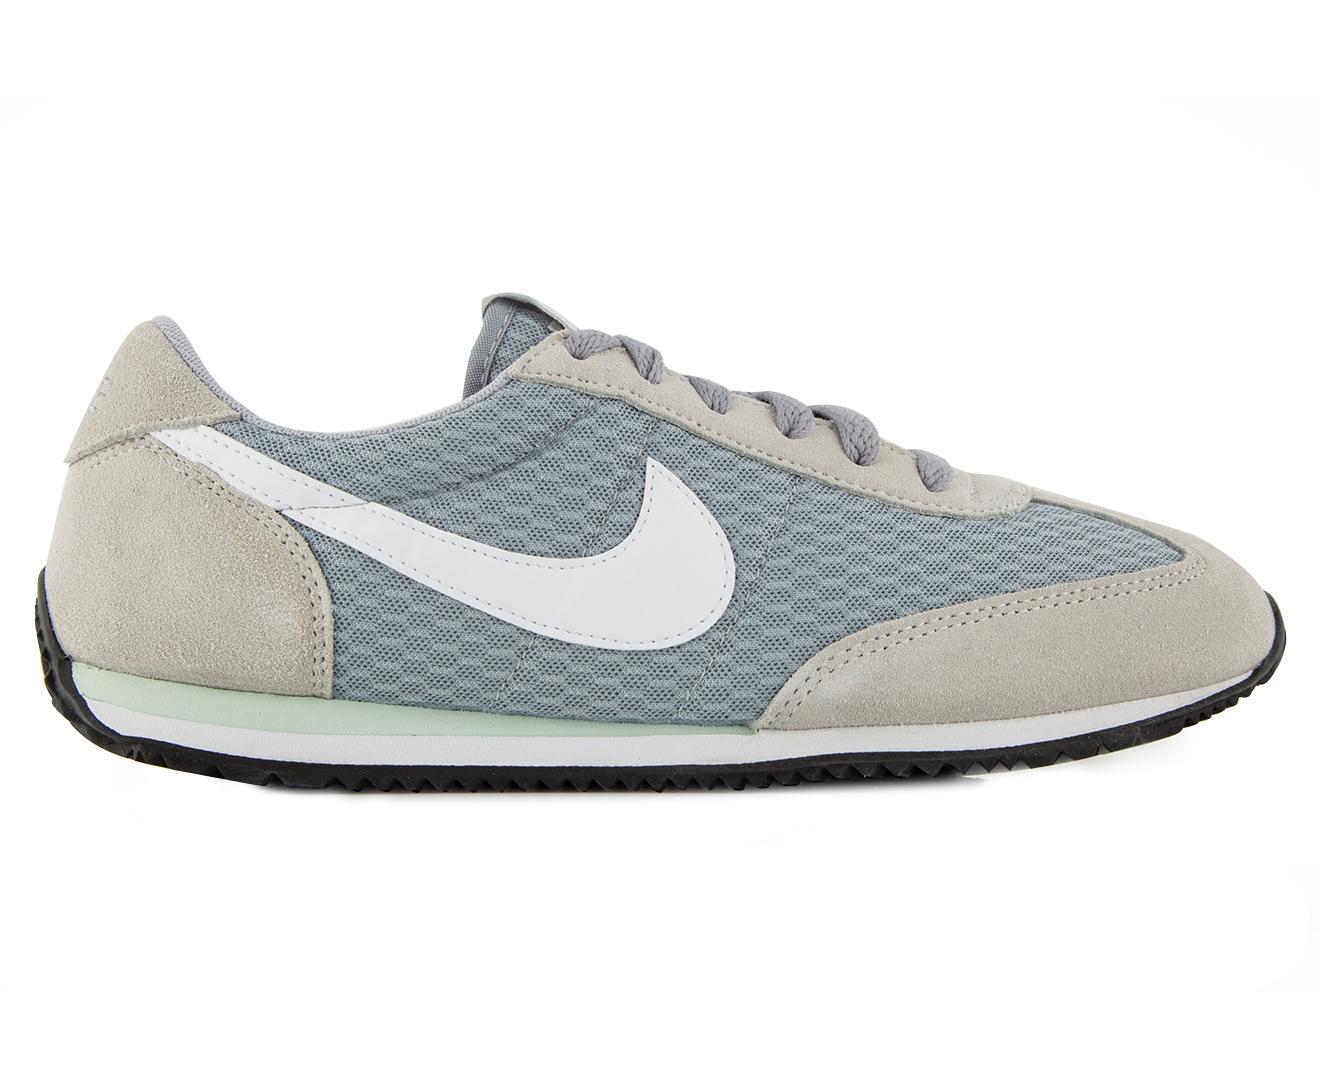 c31bceb31 Nike Women s Oceania Textile Shoe - Wolf Grey White-Pure Platinum